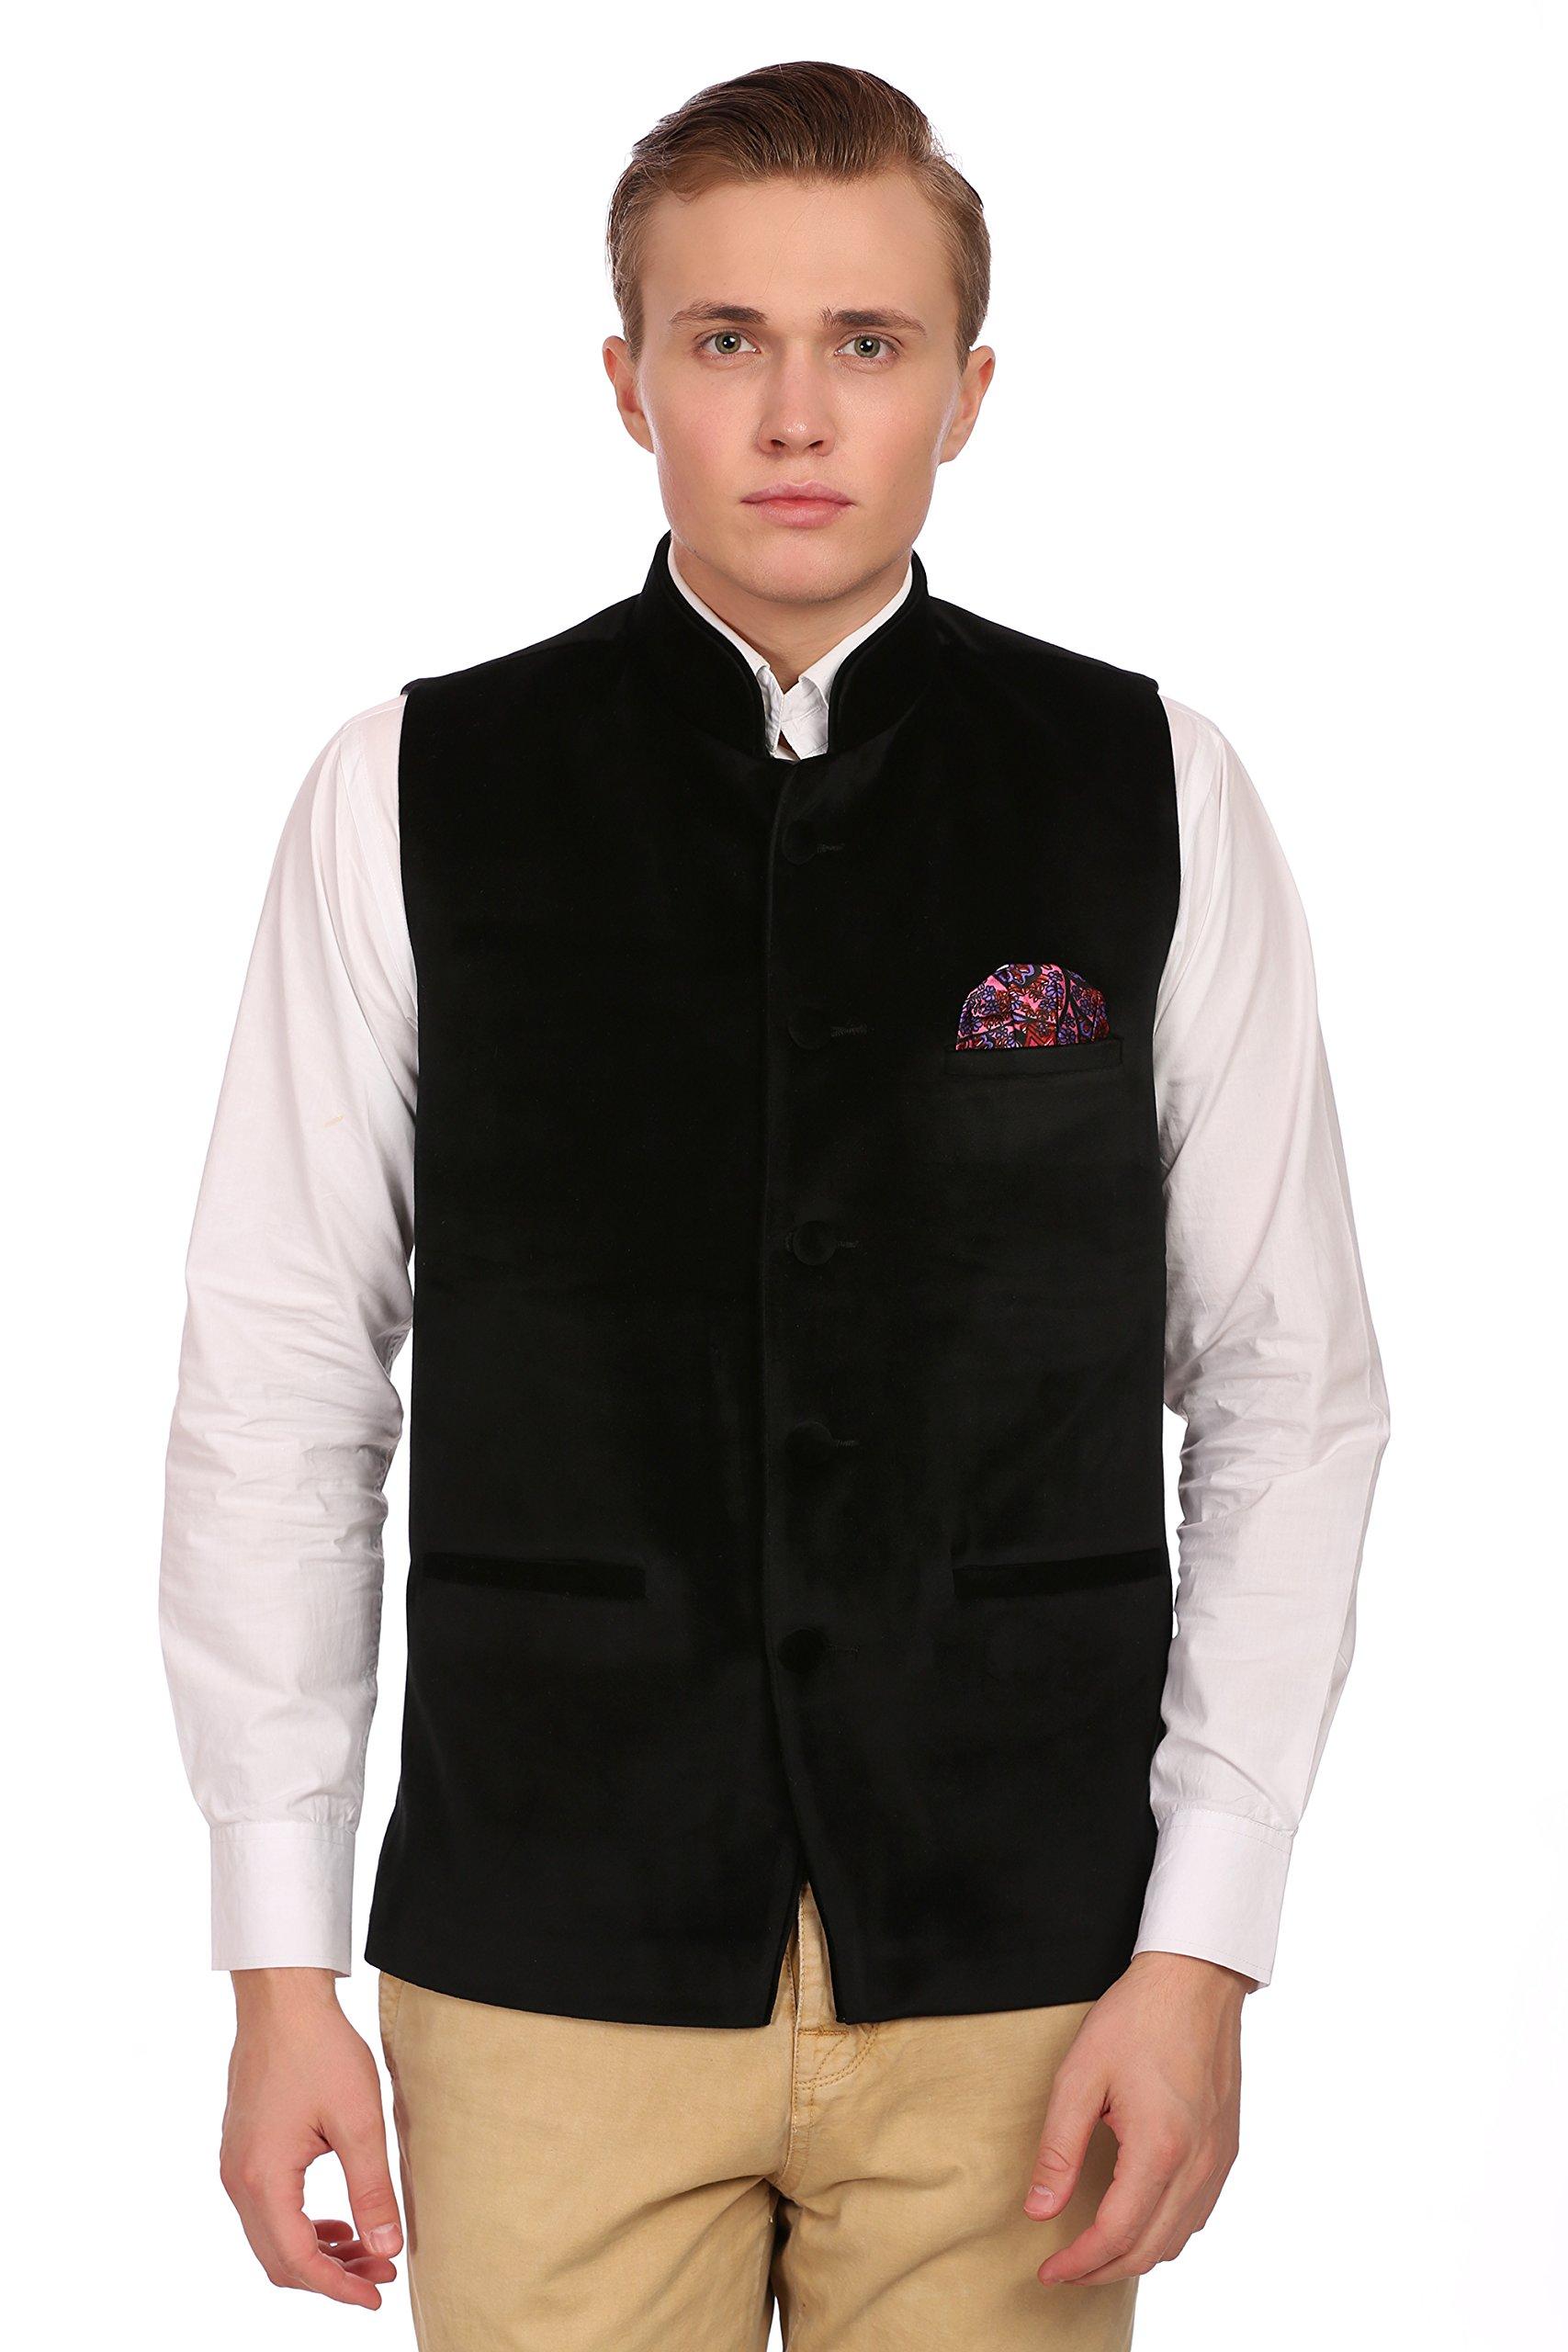 WINTAGE Men's Velvet Grandad Collar Party Black Nehru Vest Waistcoat,52/5XL